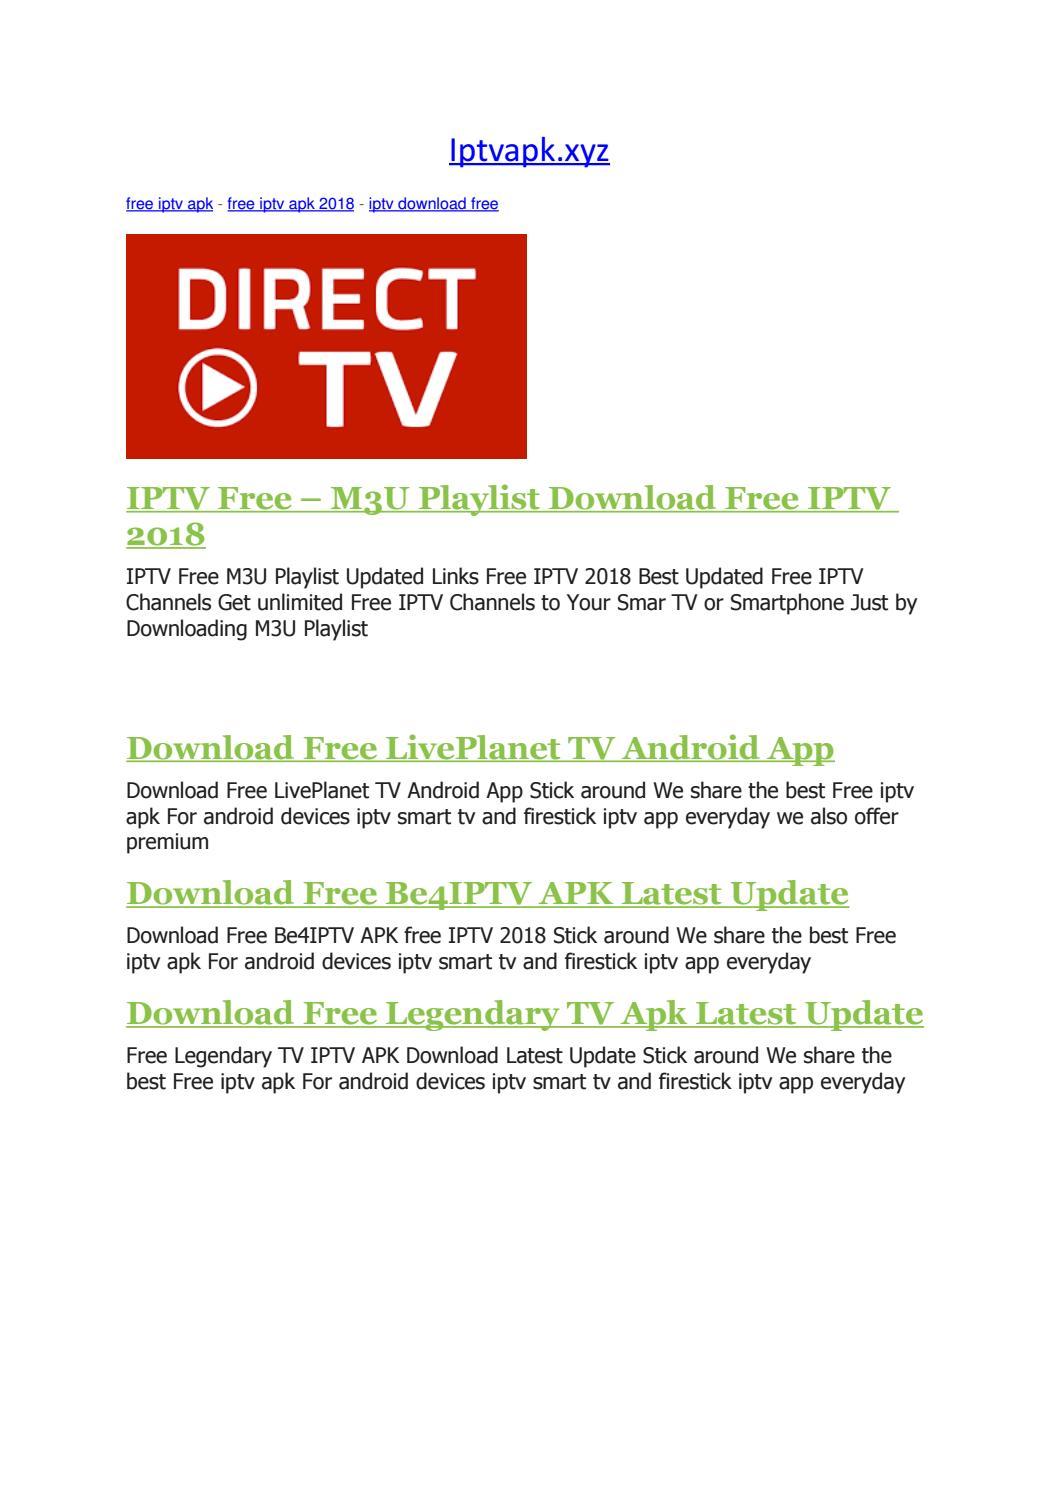 tvtap firestick 2.6 apk download